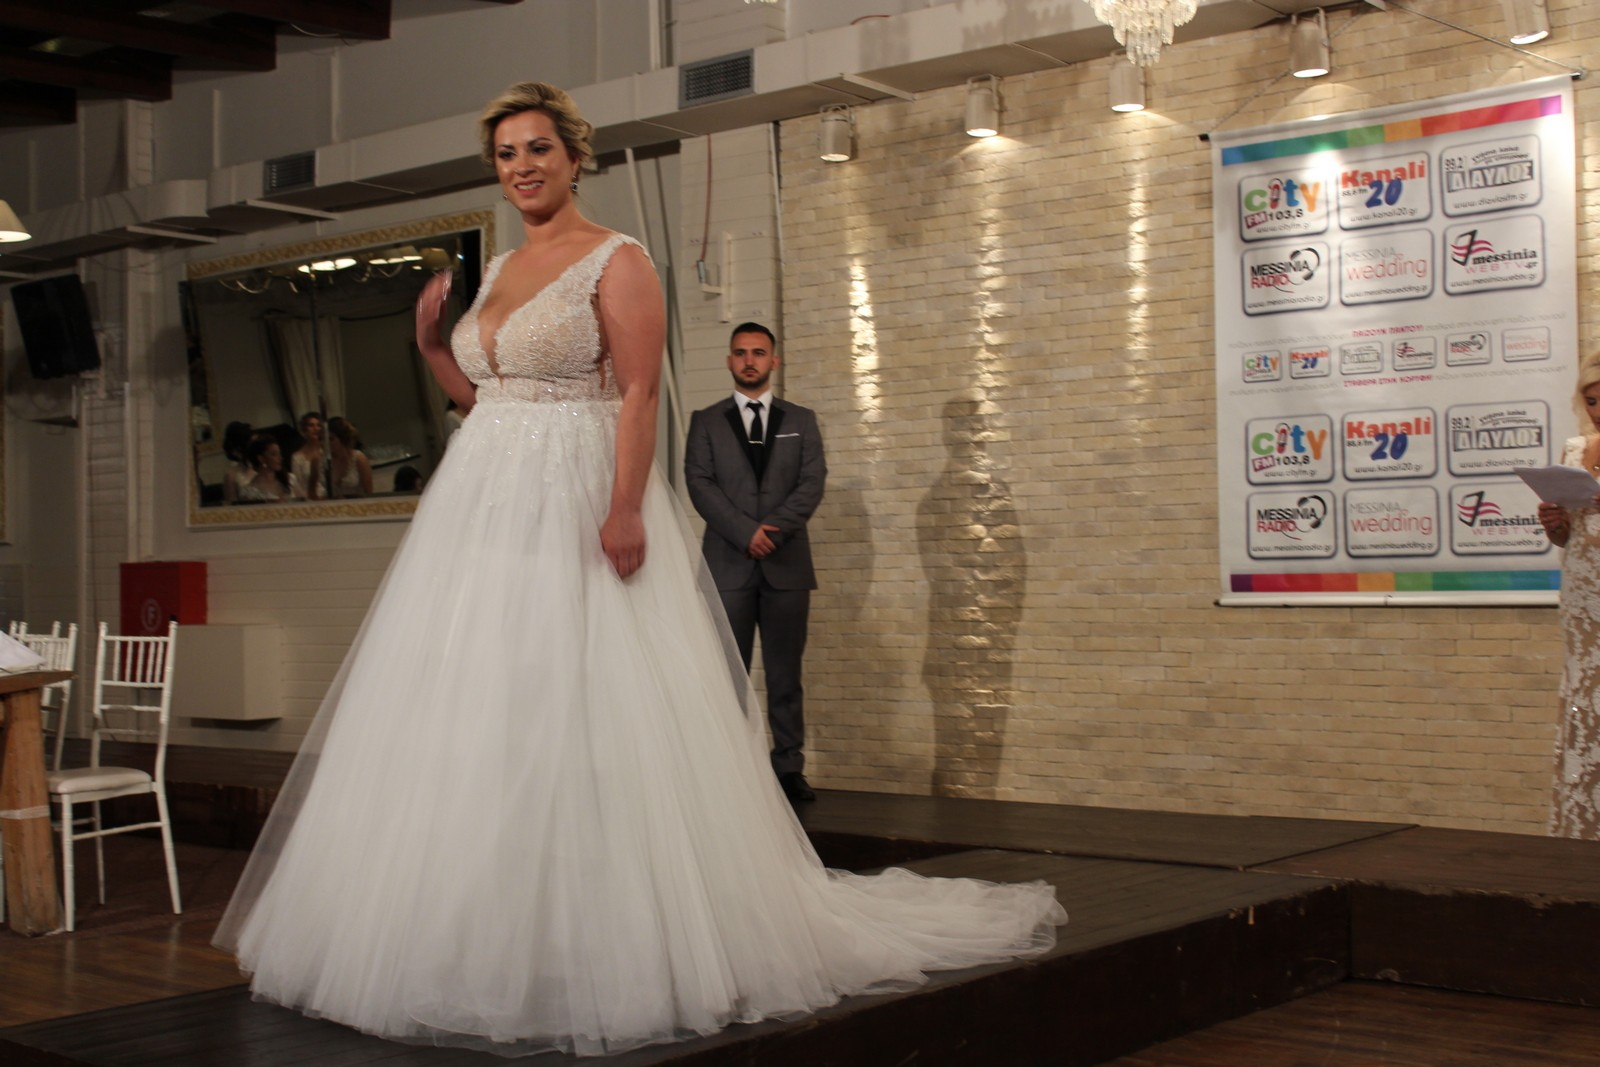 eae1ba81f84 Η κλήρωση του διαγωνισμού «Ένας Γάμος Όνειρο 2019», πραγματοποιήθηκε ...